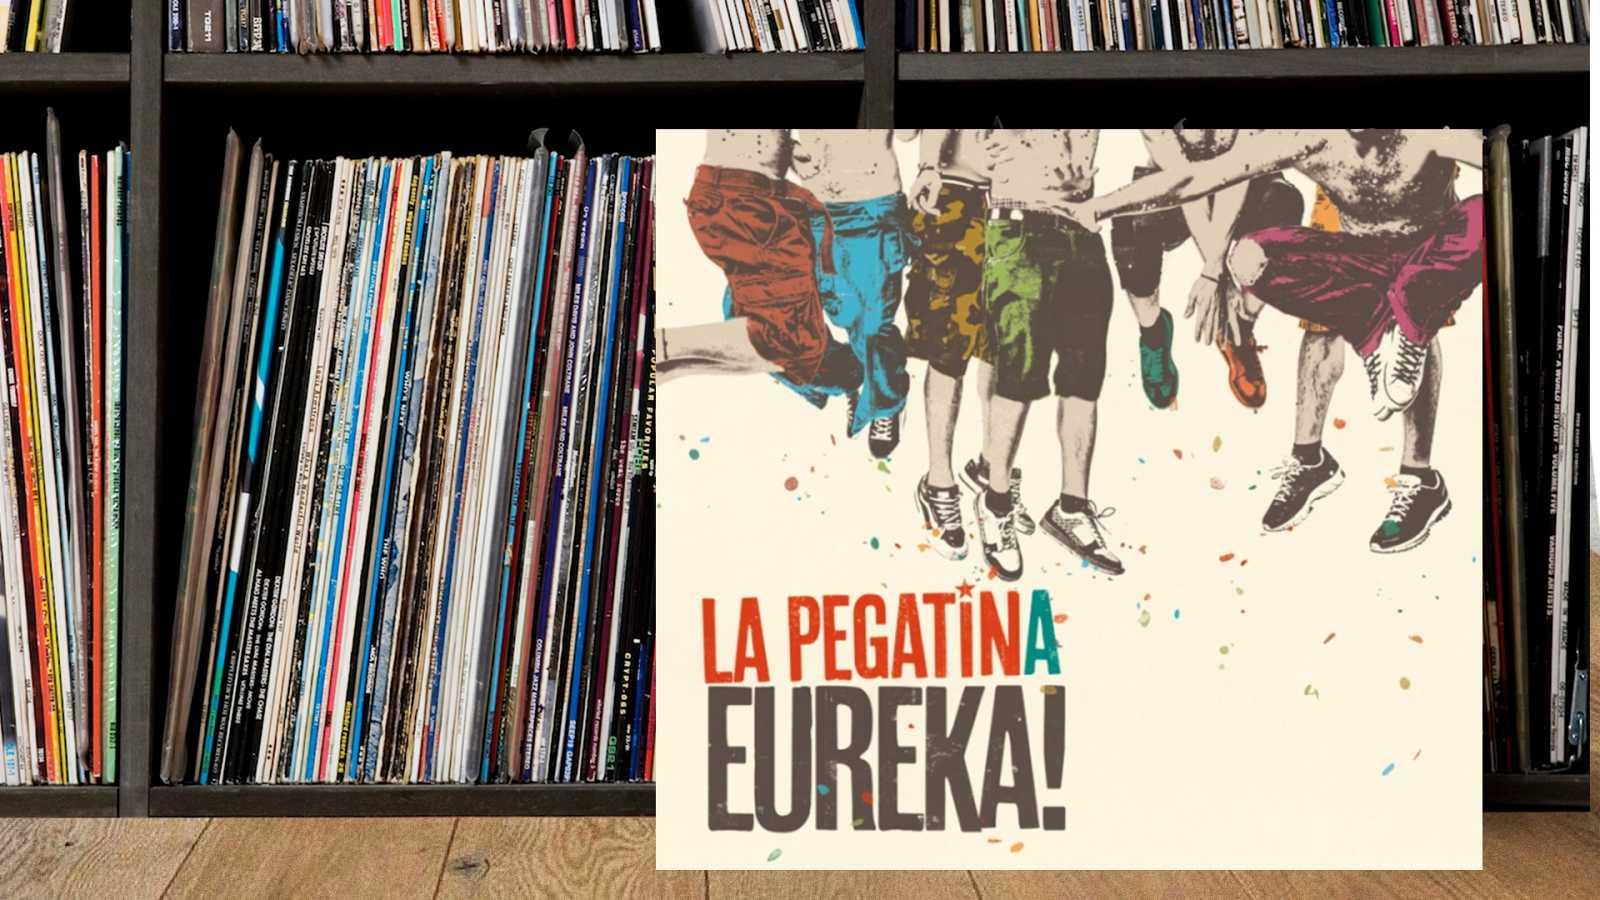 Doce Pulgadas - La Pegatina: Eureka! - 23/09/2021 - Escuchar ahora